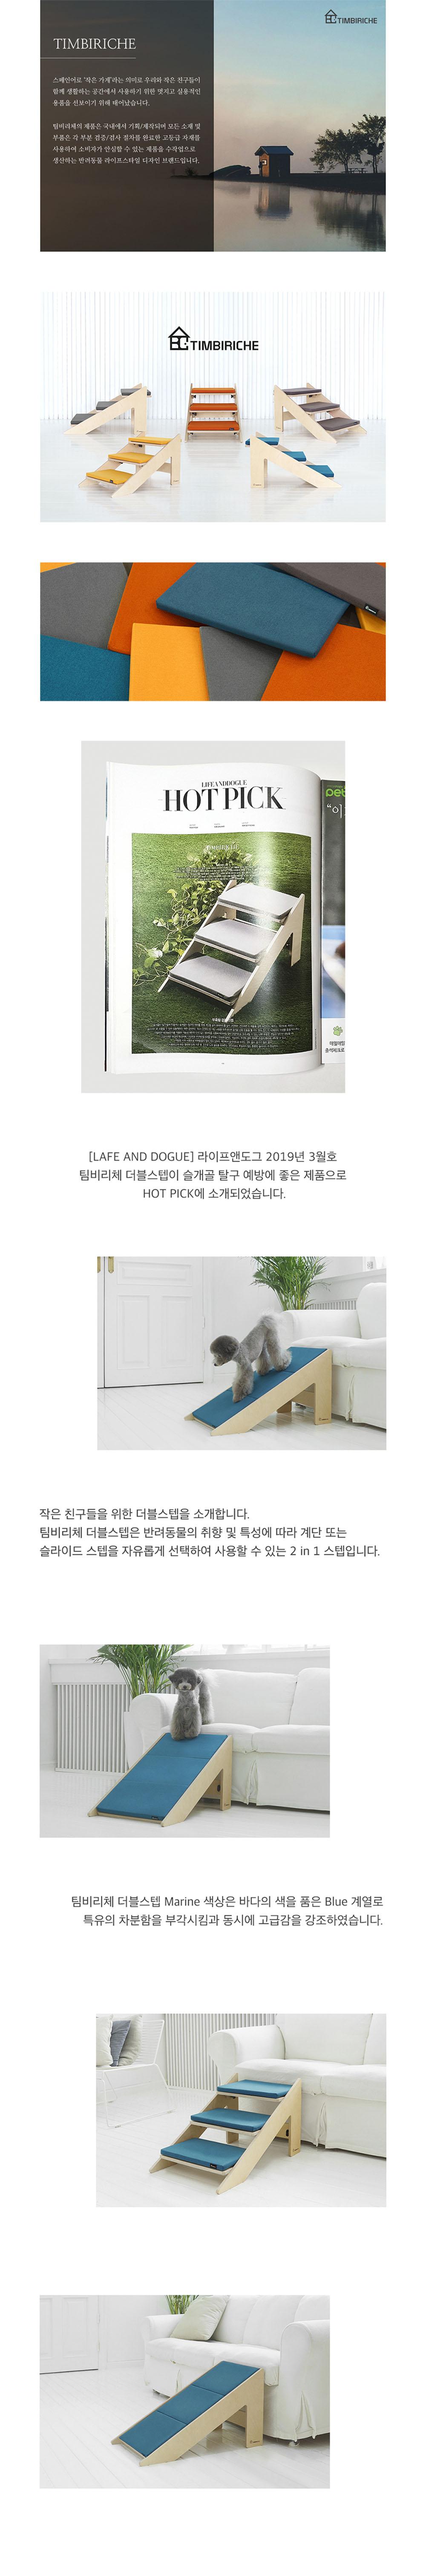 DOUBLE STEP - MARINE - 팀비리체, 186,000원, 하우스/식기/실내용품, 계단